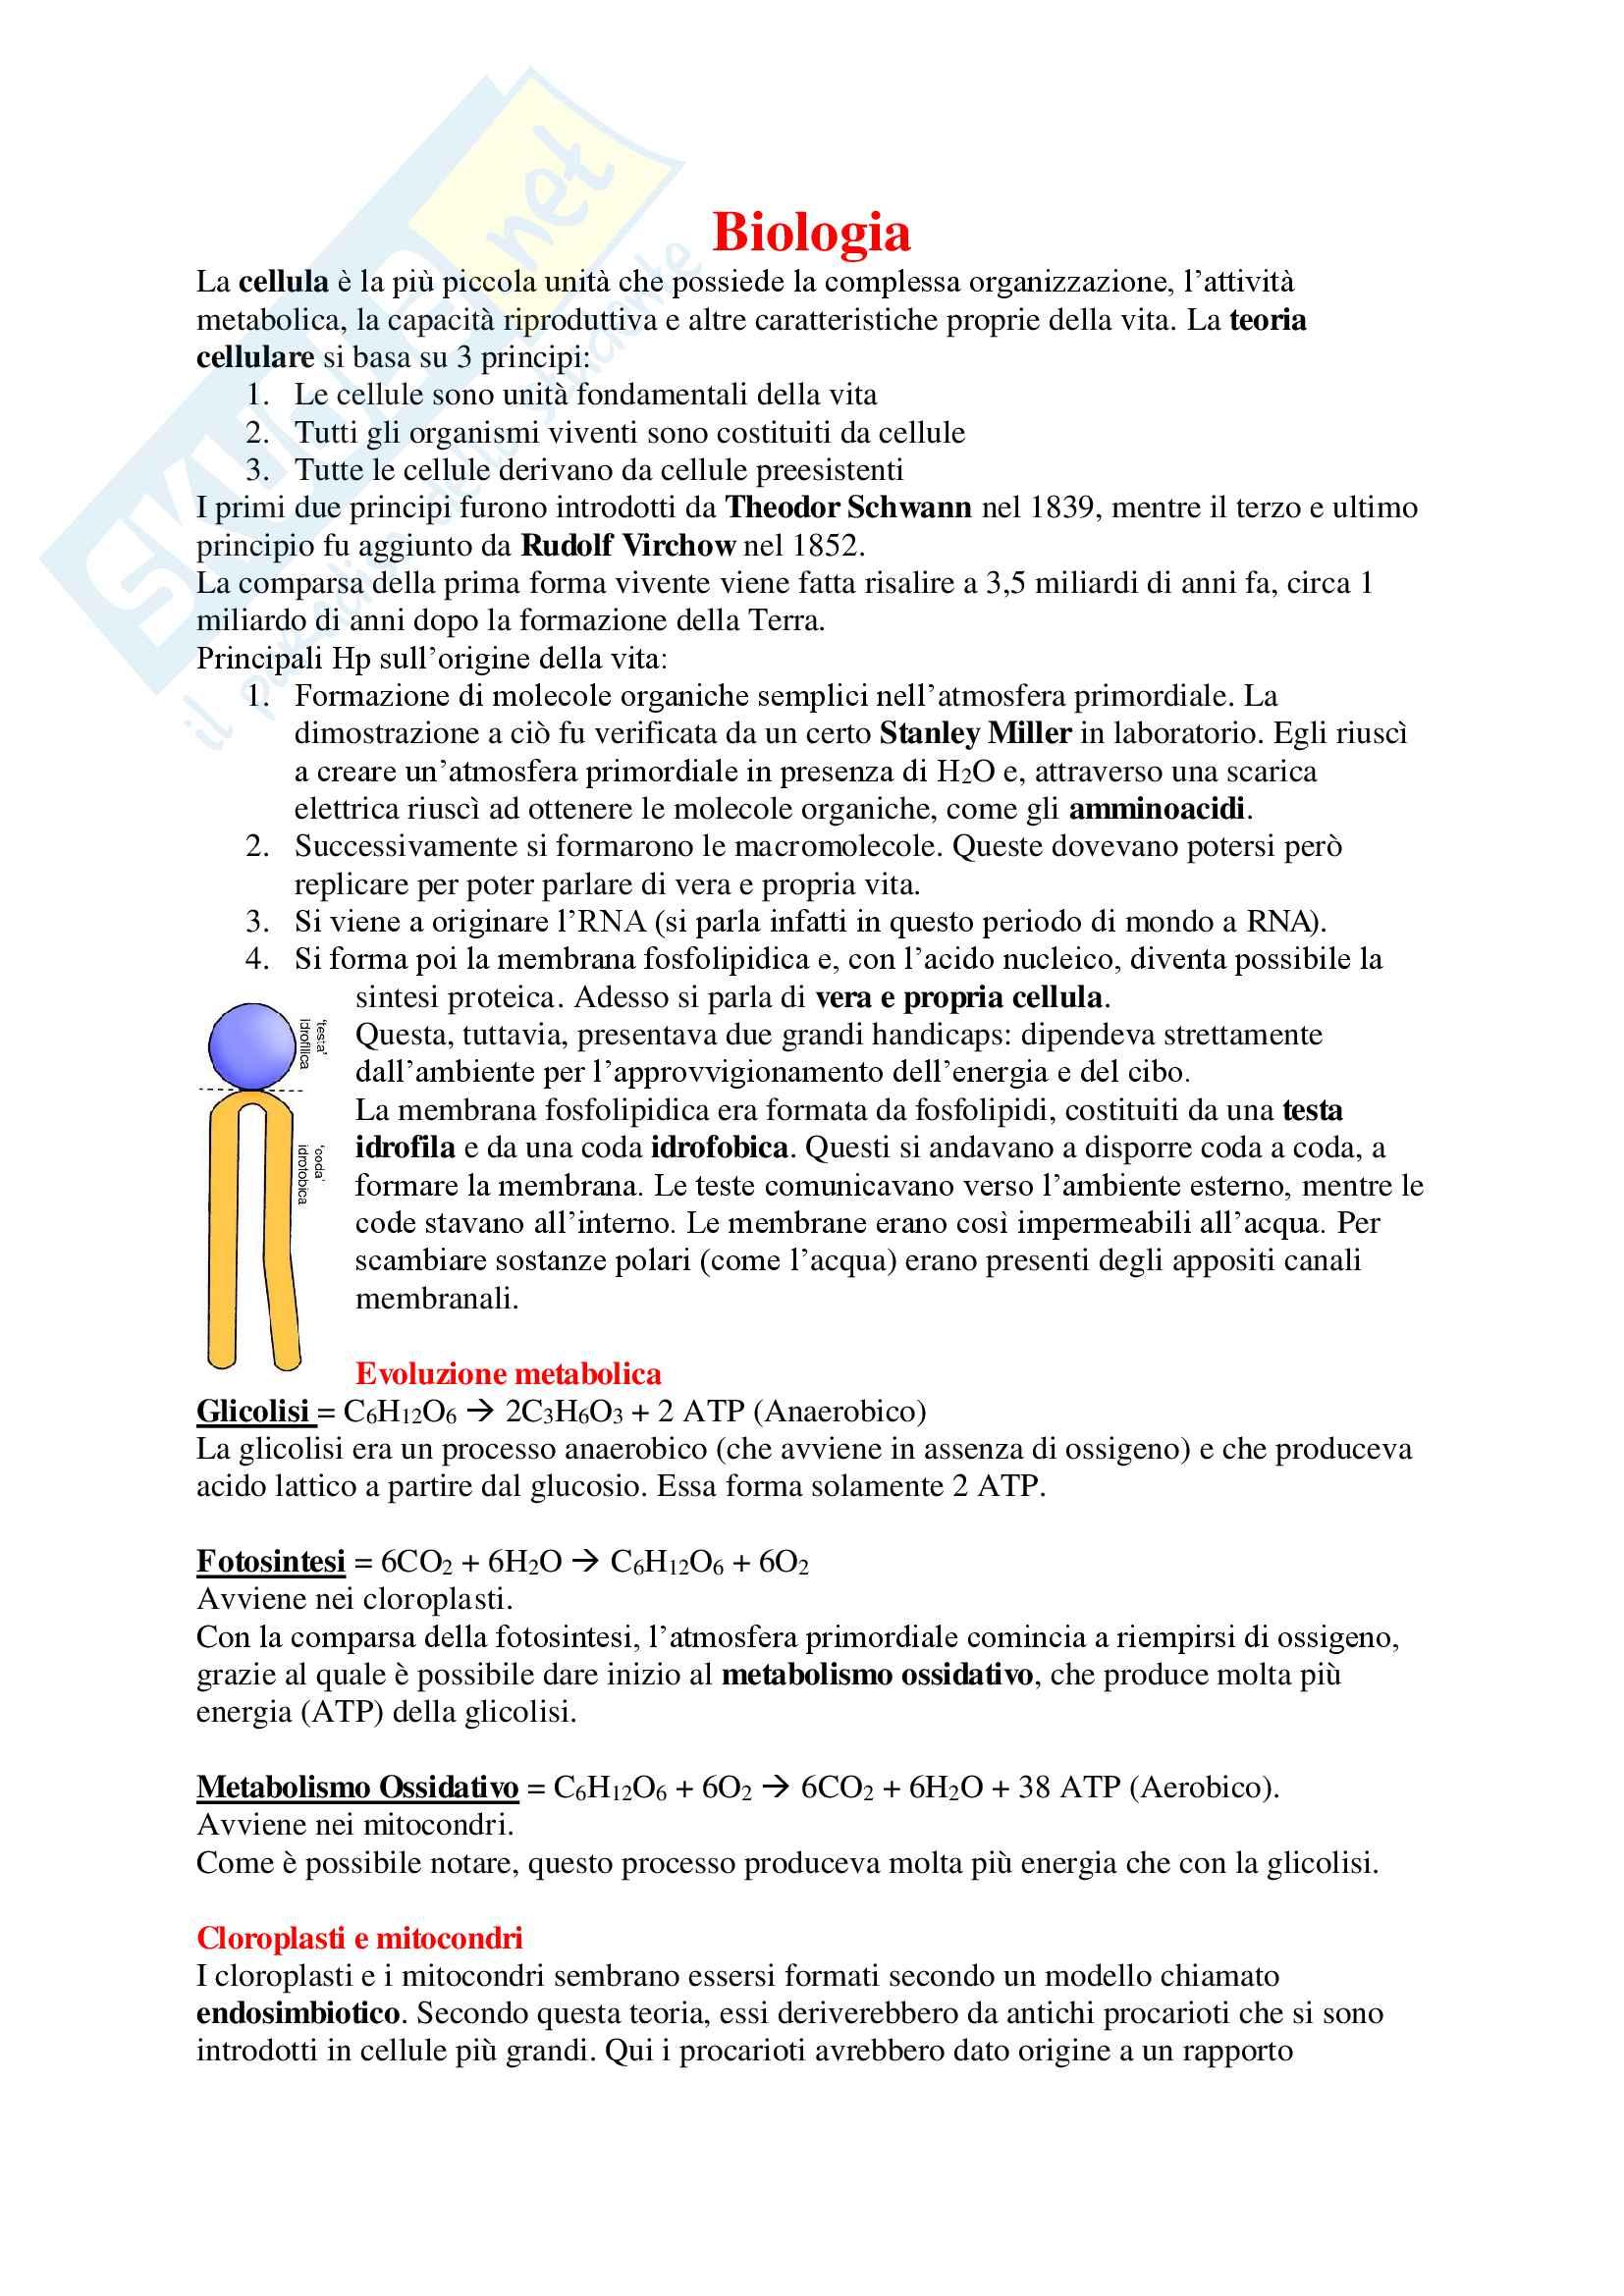 Biologia Umana - Appunti Completi